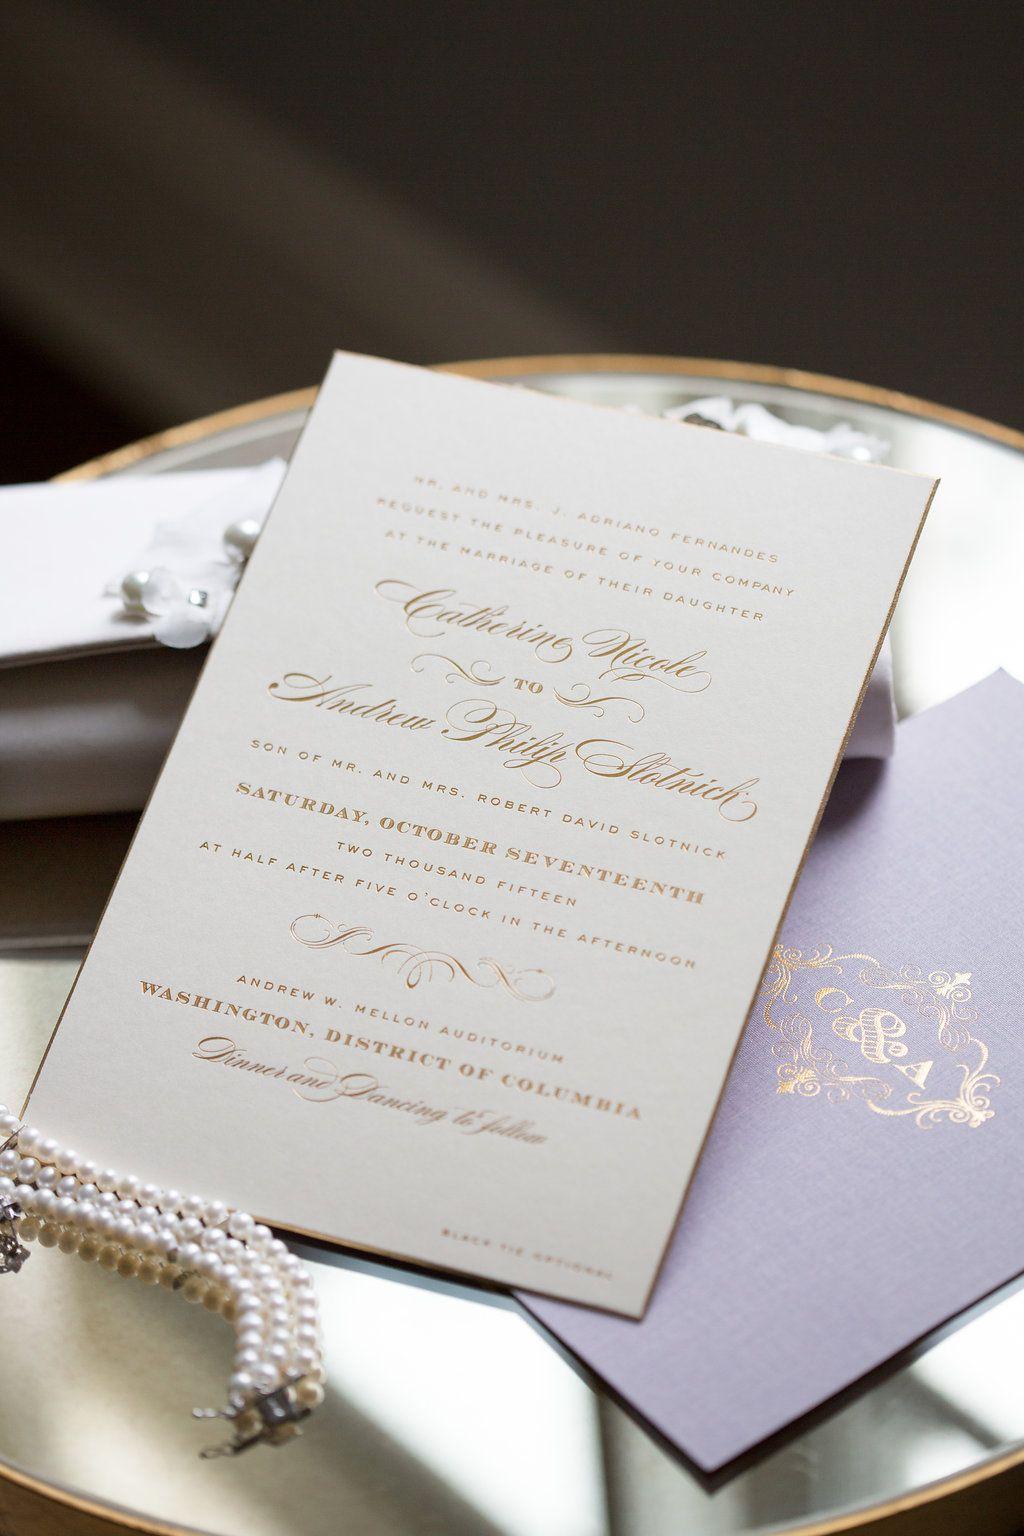 Gold foil letterpress invitation by cheree berry paper from gold foil letterpress invitation by cheree berry paper from romantic all white wedding at dc mellon stopboris Gallery